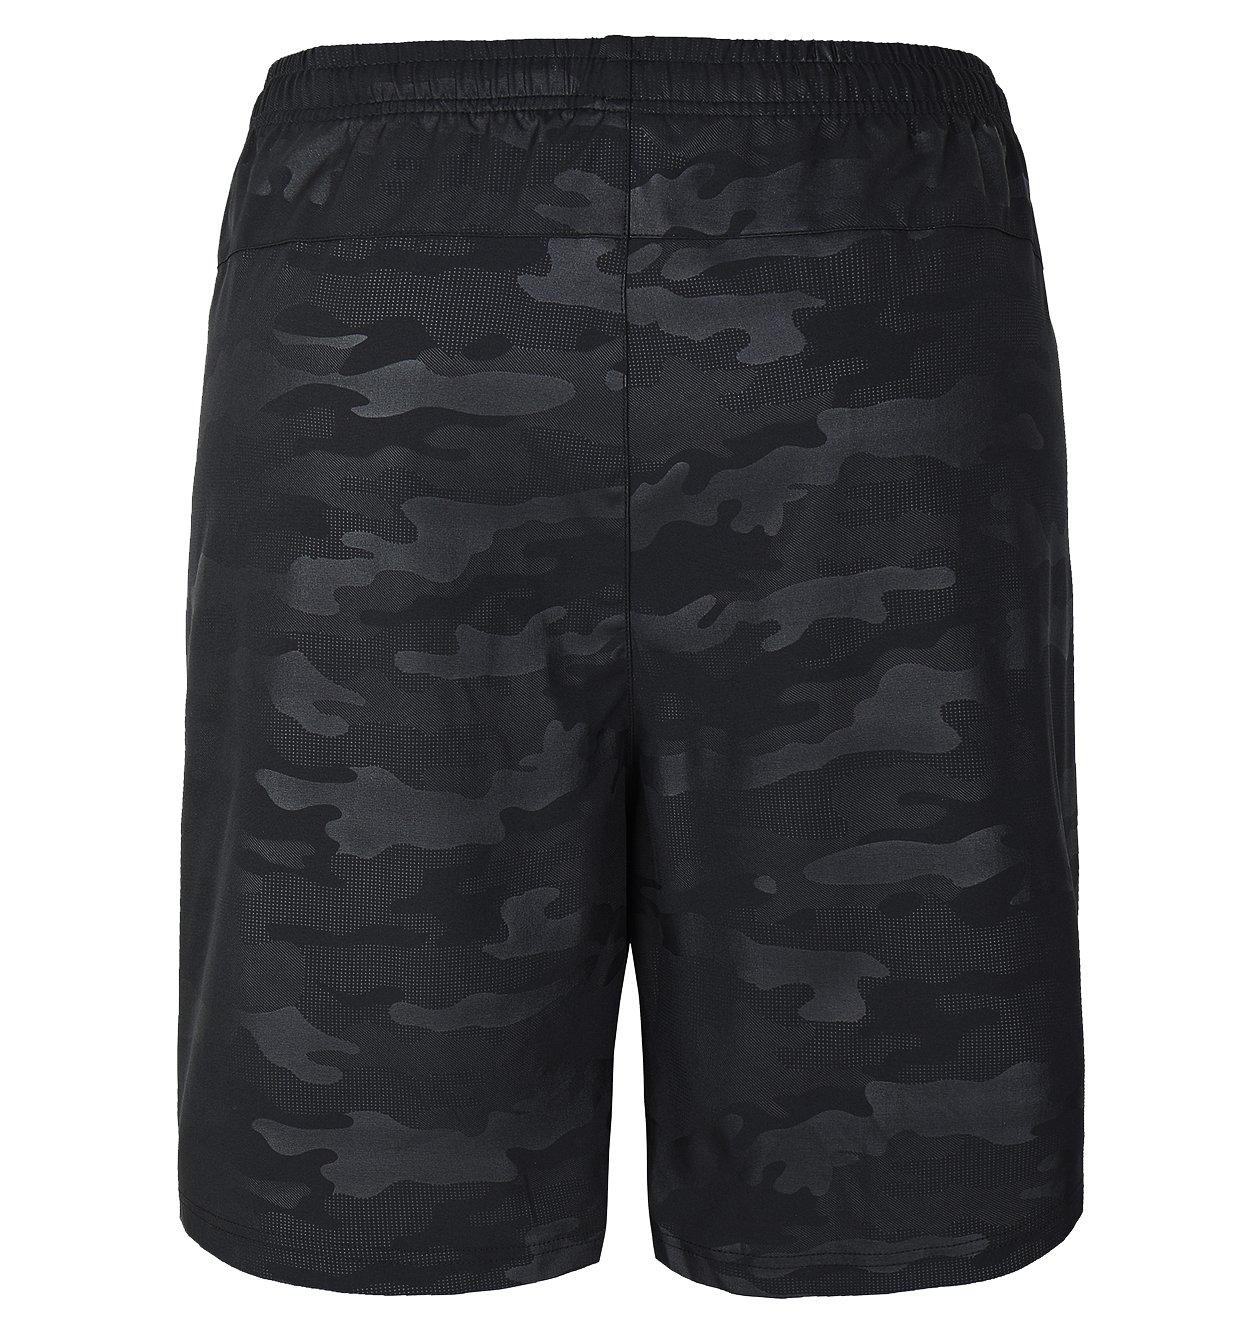 Gititlys Men\'s Shorts with Pockets 95% Terylene and 5% Spandex (Classic Black, Medium)